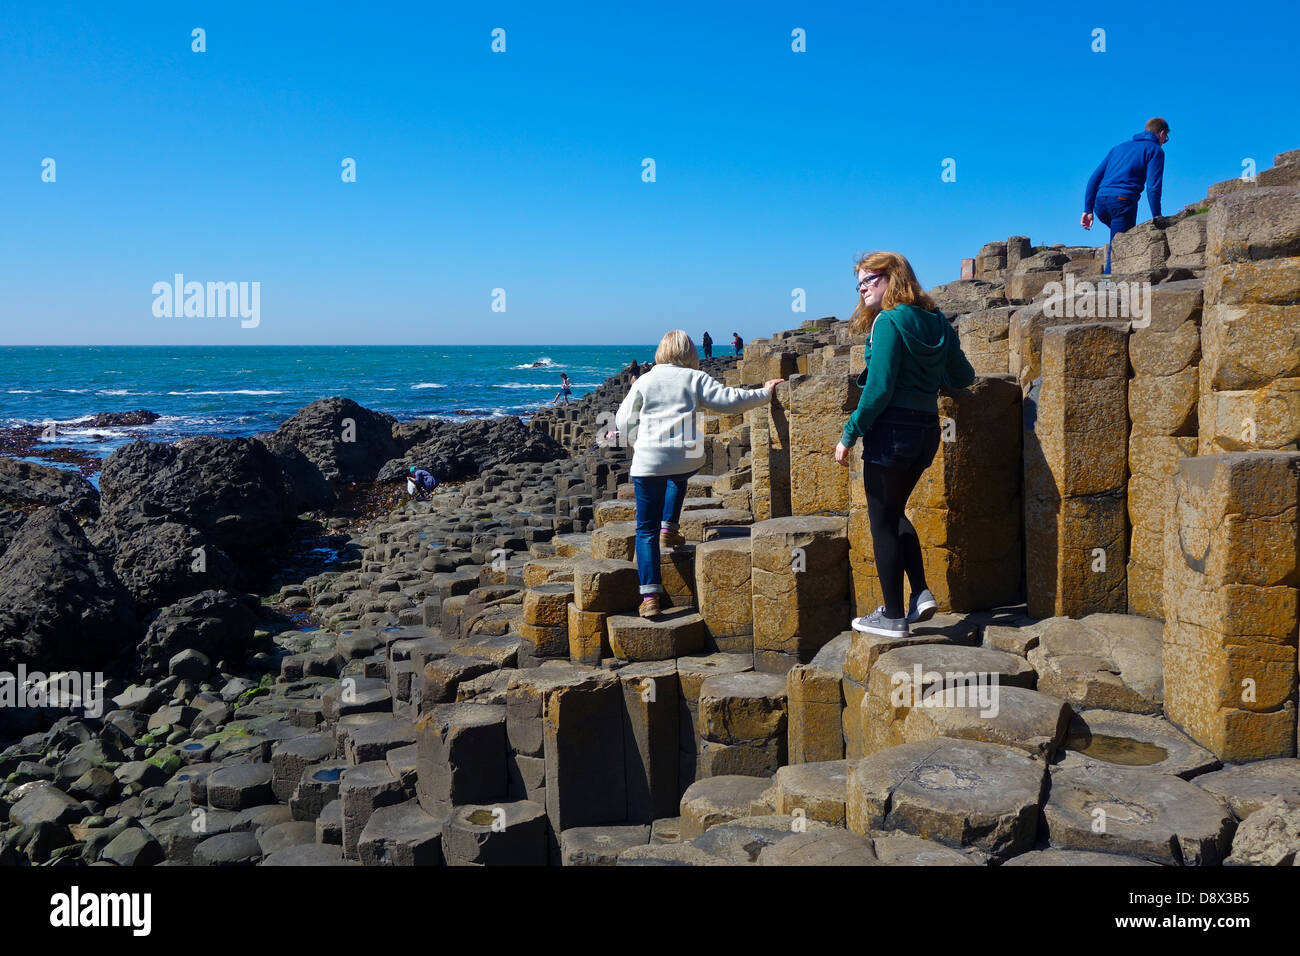 Tourists on Giants causeway - Stock Image